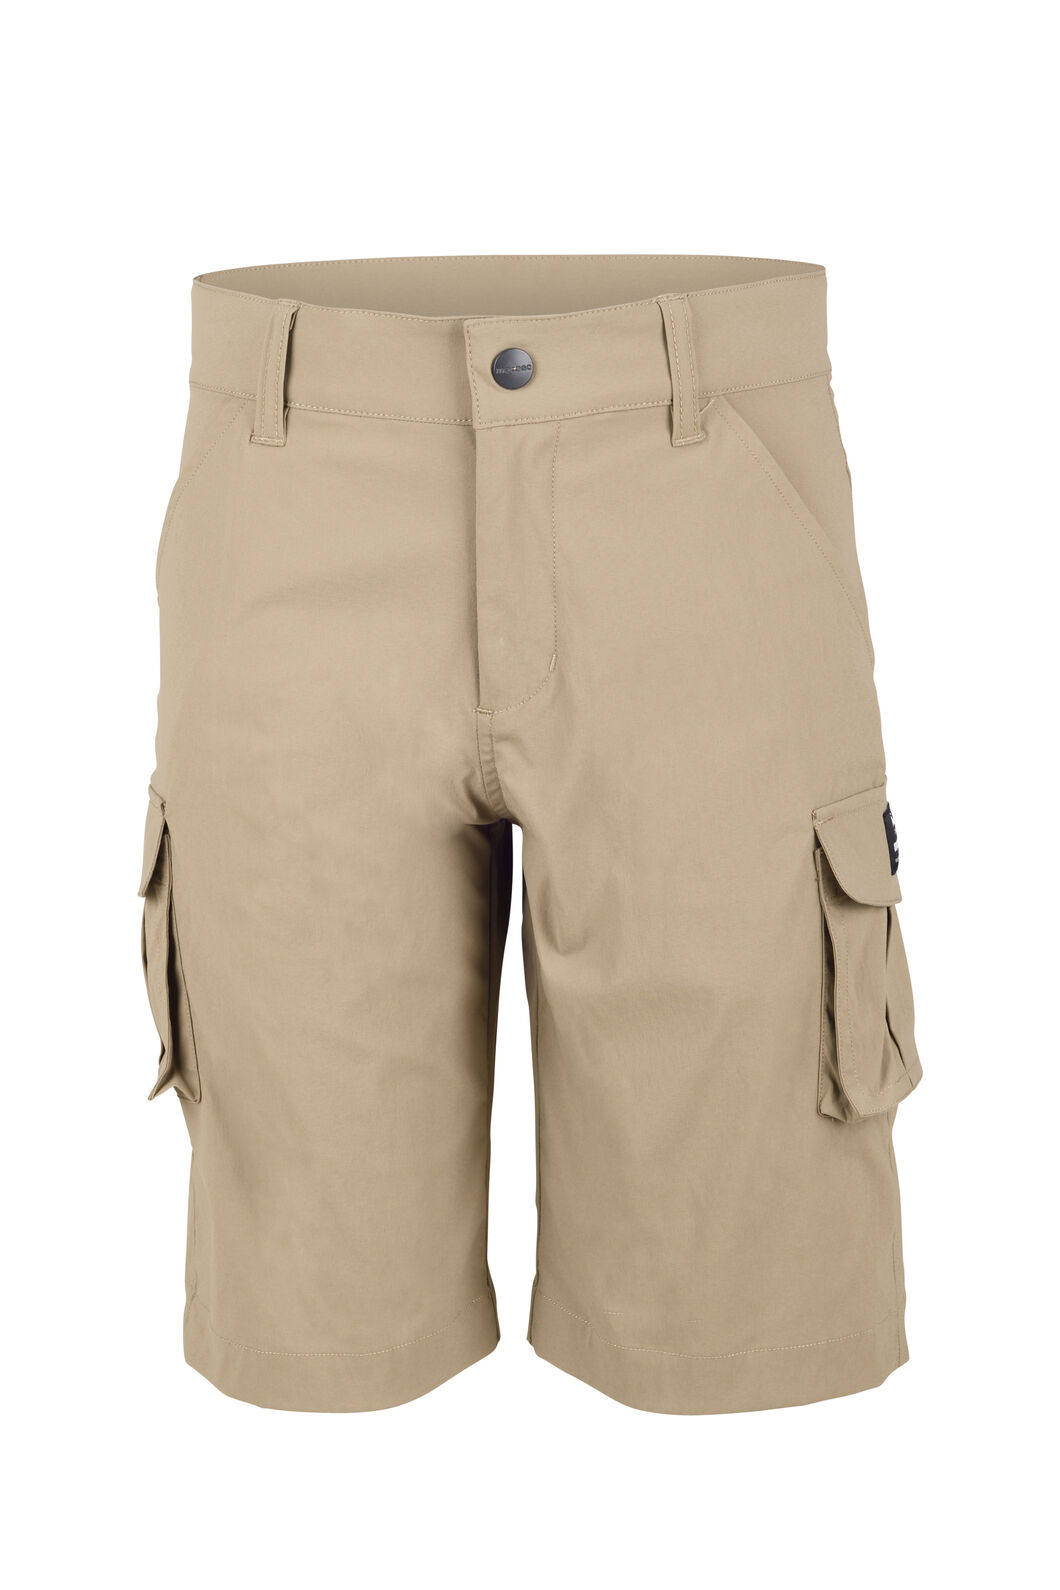 Macpac Lil Drifter Shorts - Kids', Covert Green, hi-res